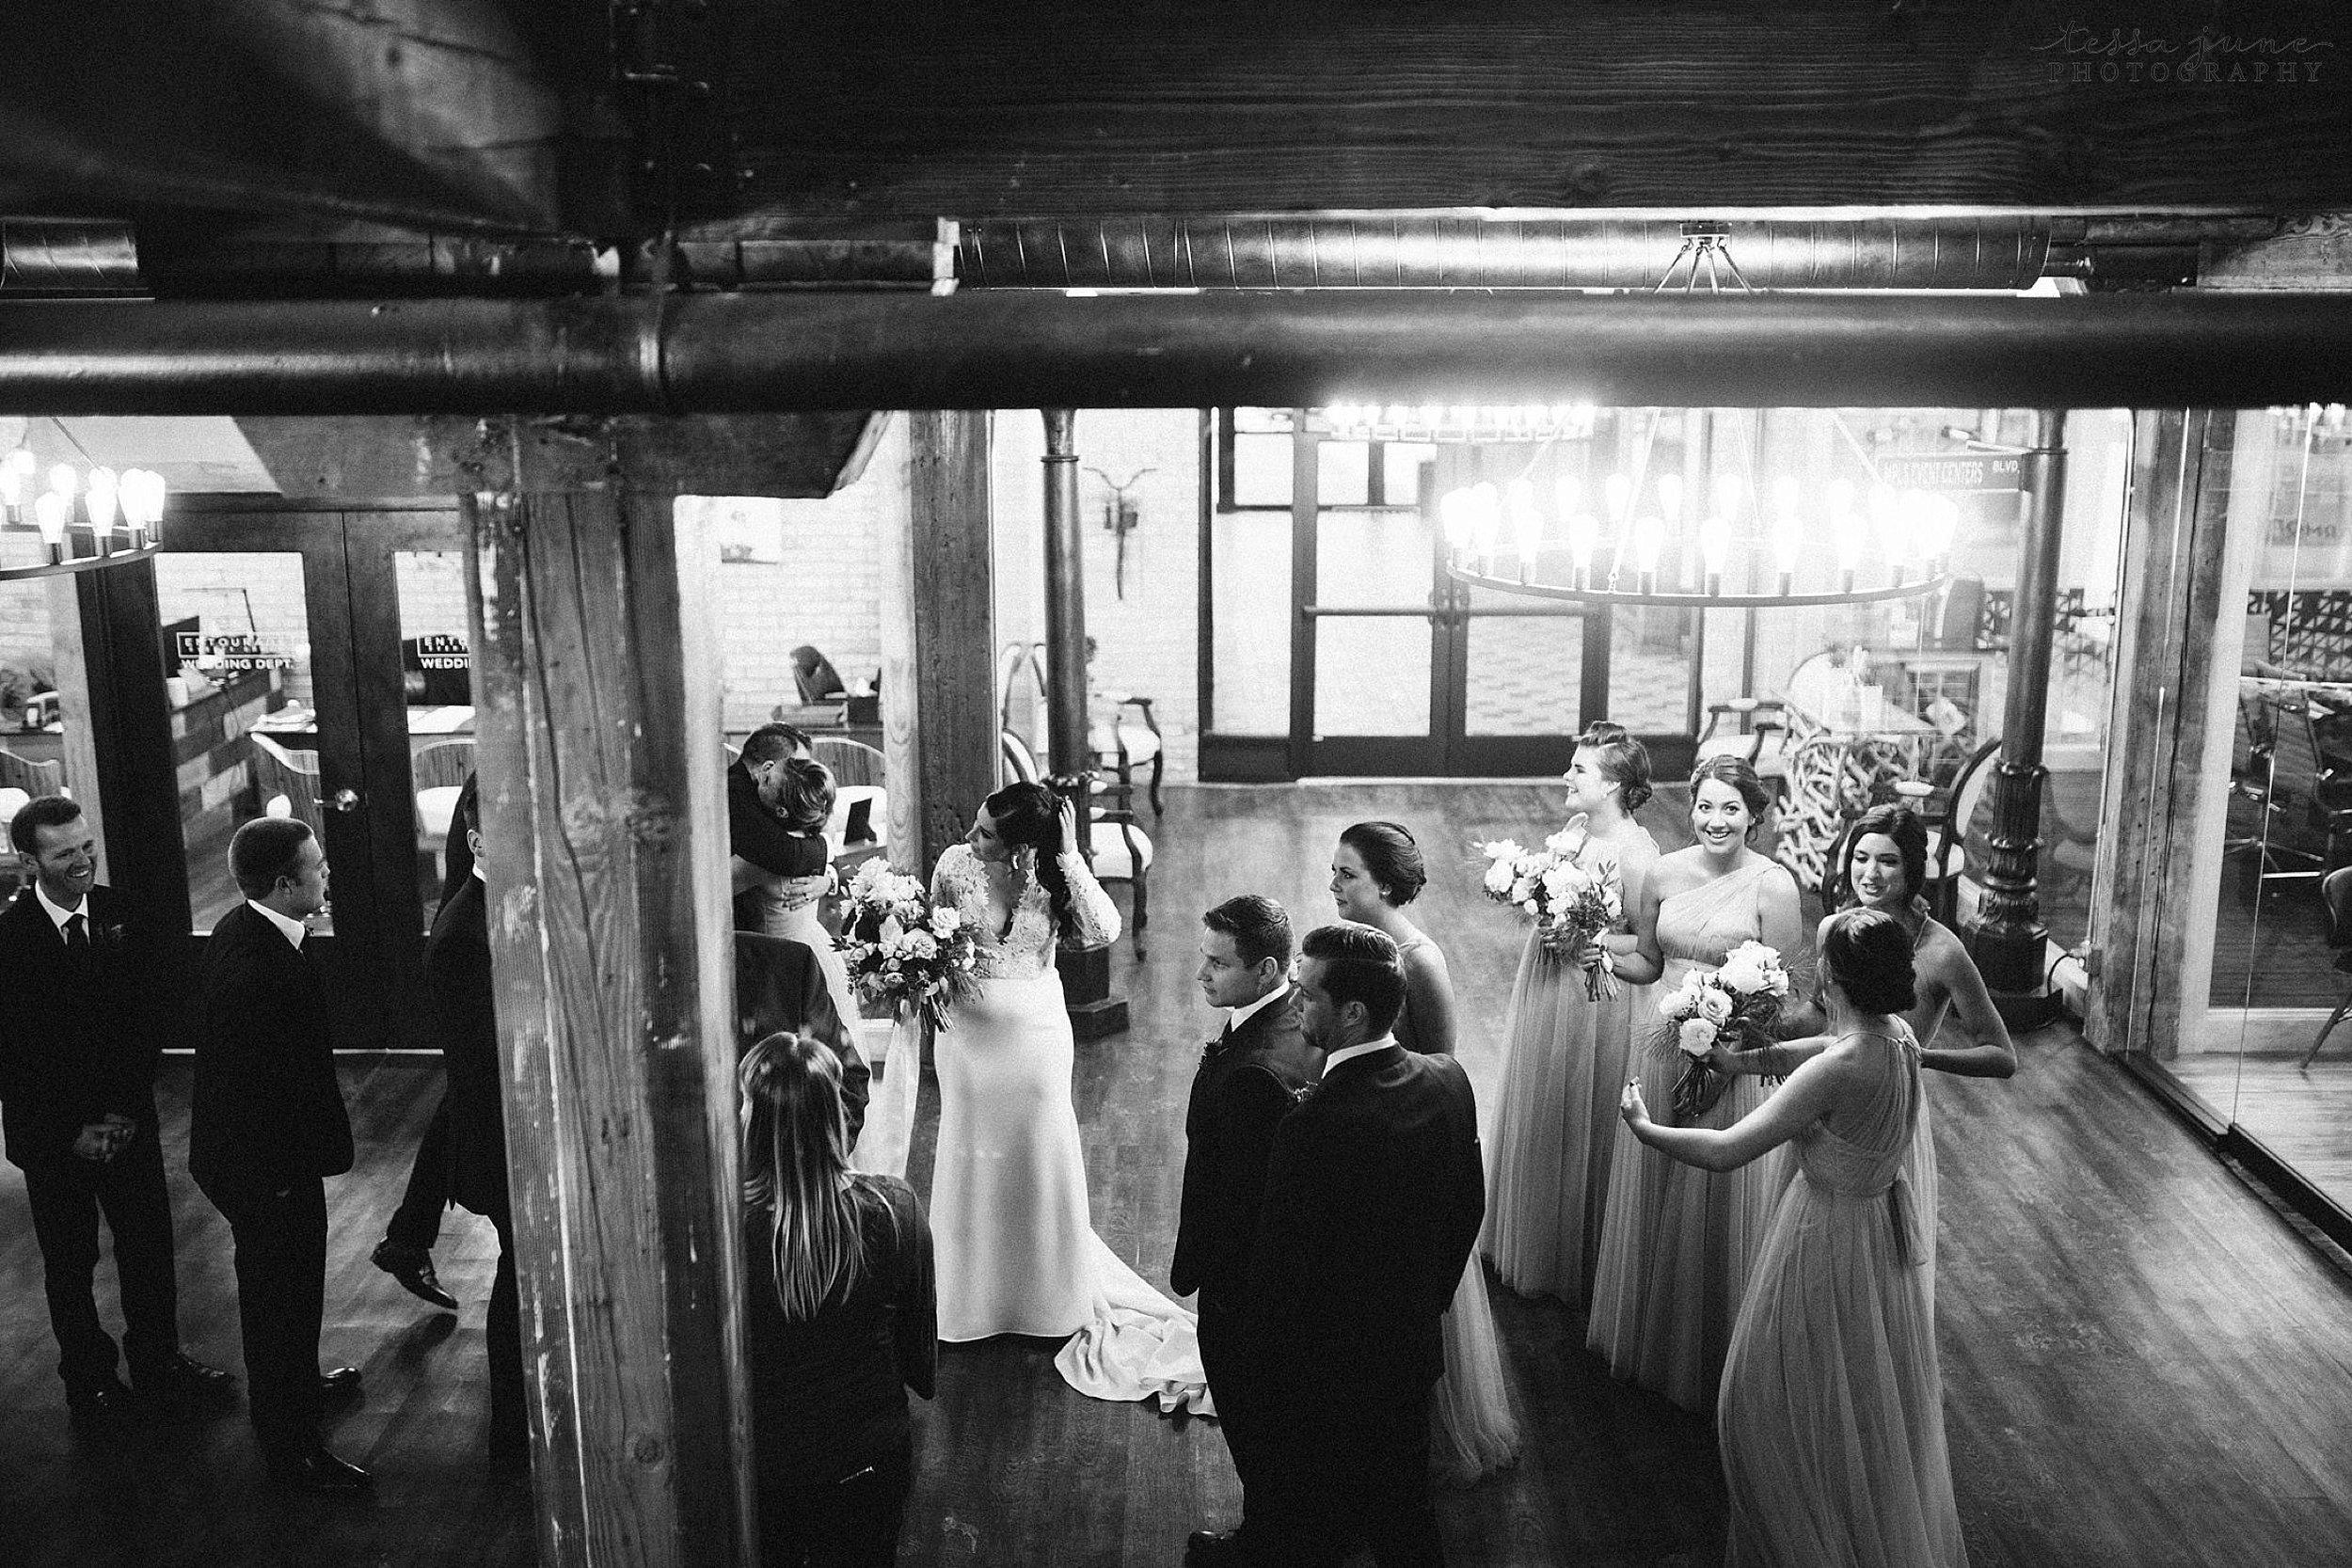 minneapolis-event-center-winter-romantic-snow-wedding-december-158.jpg